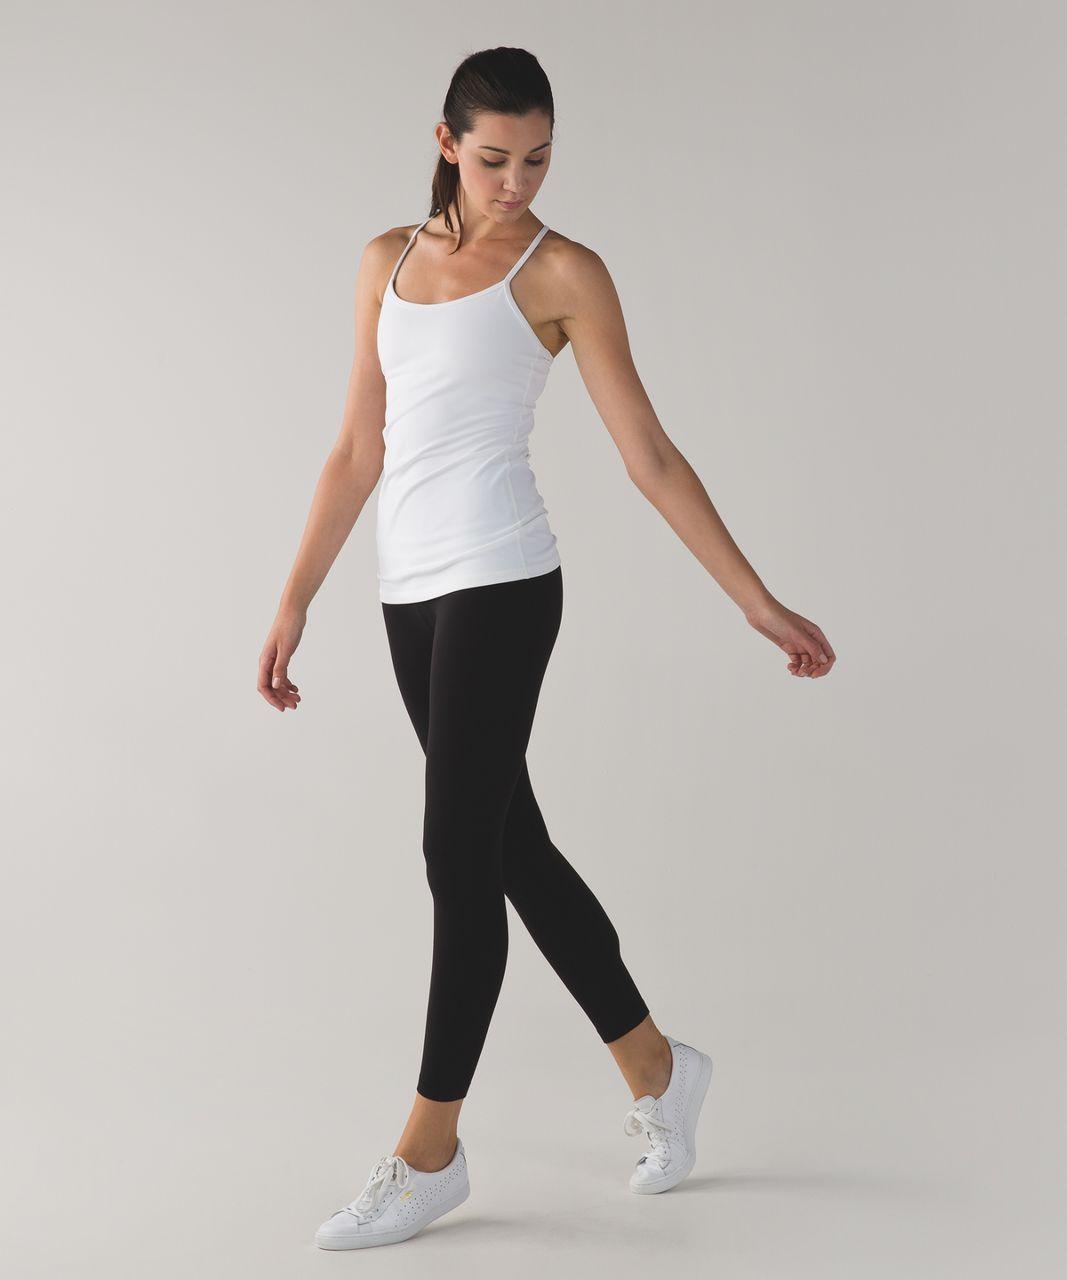 Lululemon Align Pant - Black / Menthol